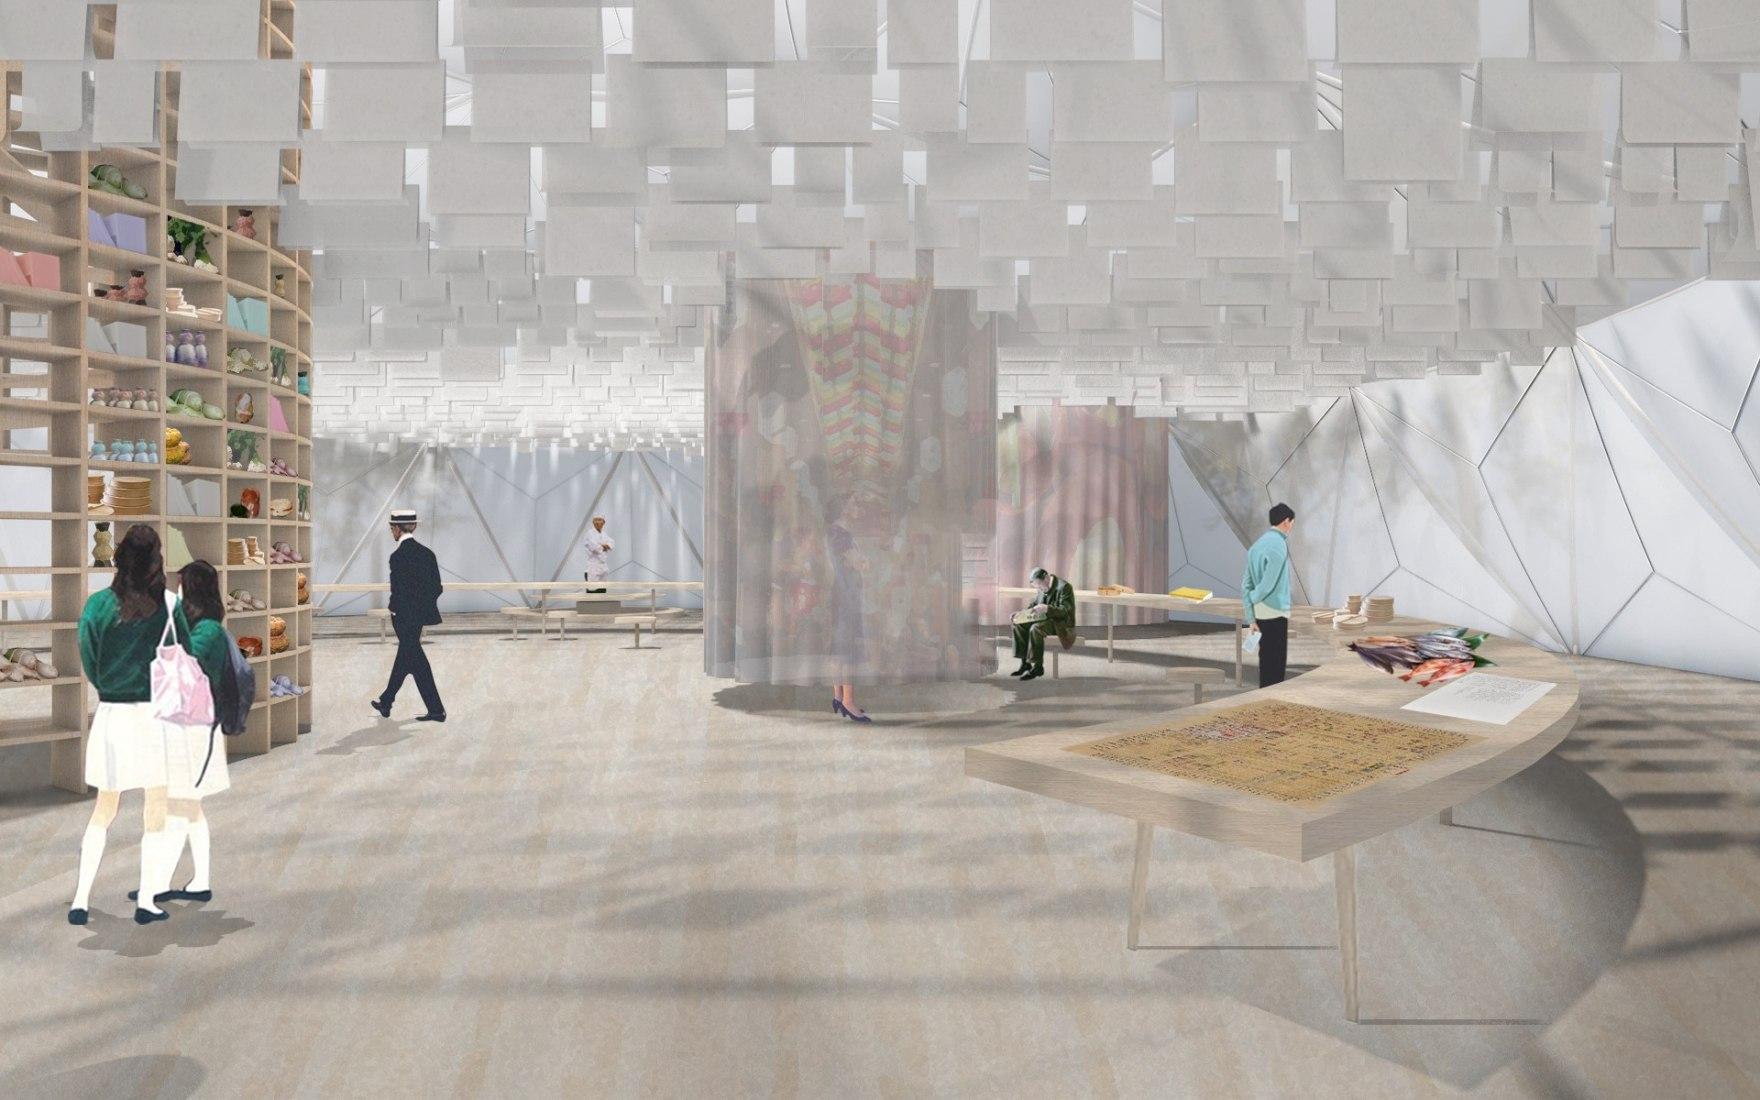 Exhibition rendering © Manuel Herz/Rahbaran Hürzeler, 2019.